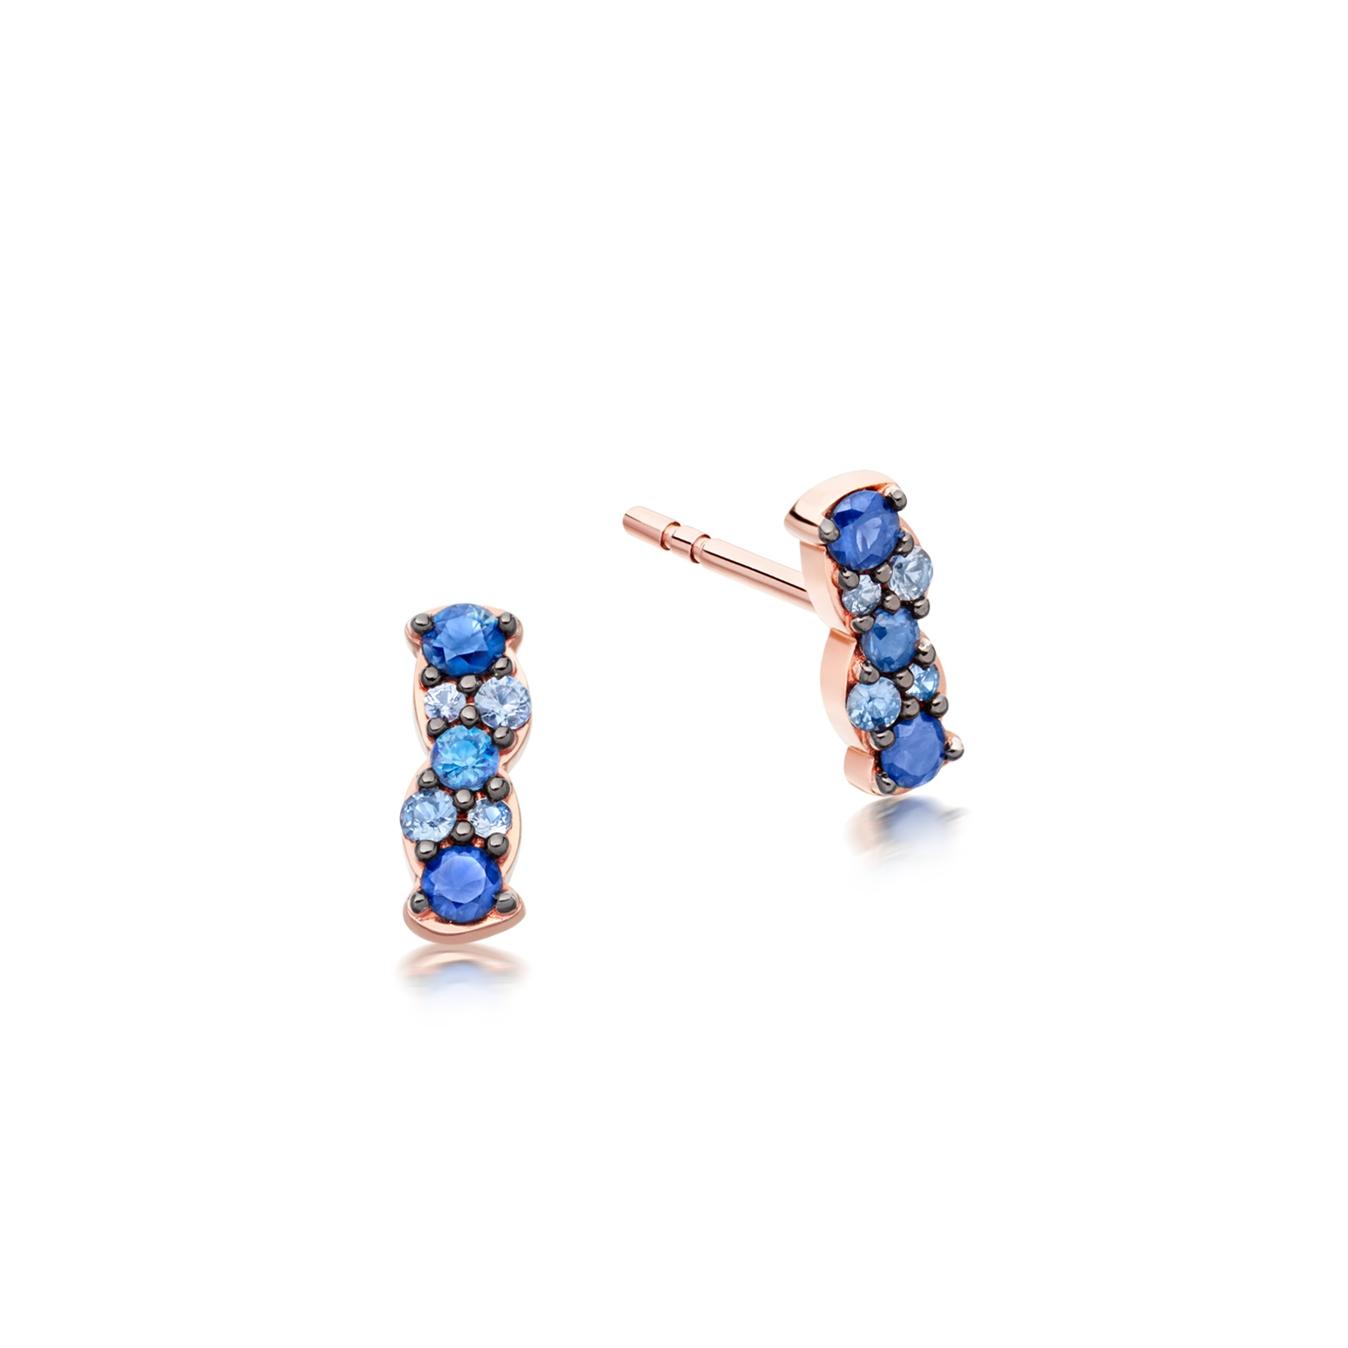 Interstellar Sapphire Bar Stud Earrings